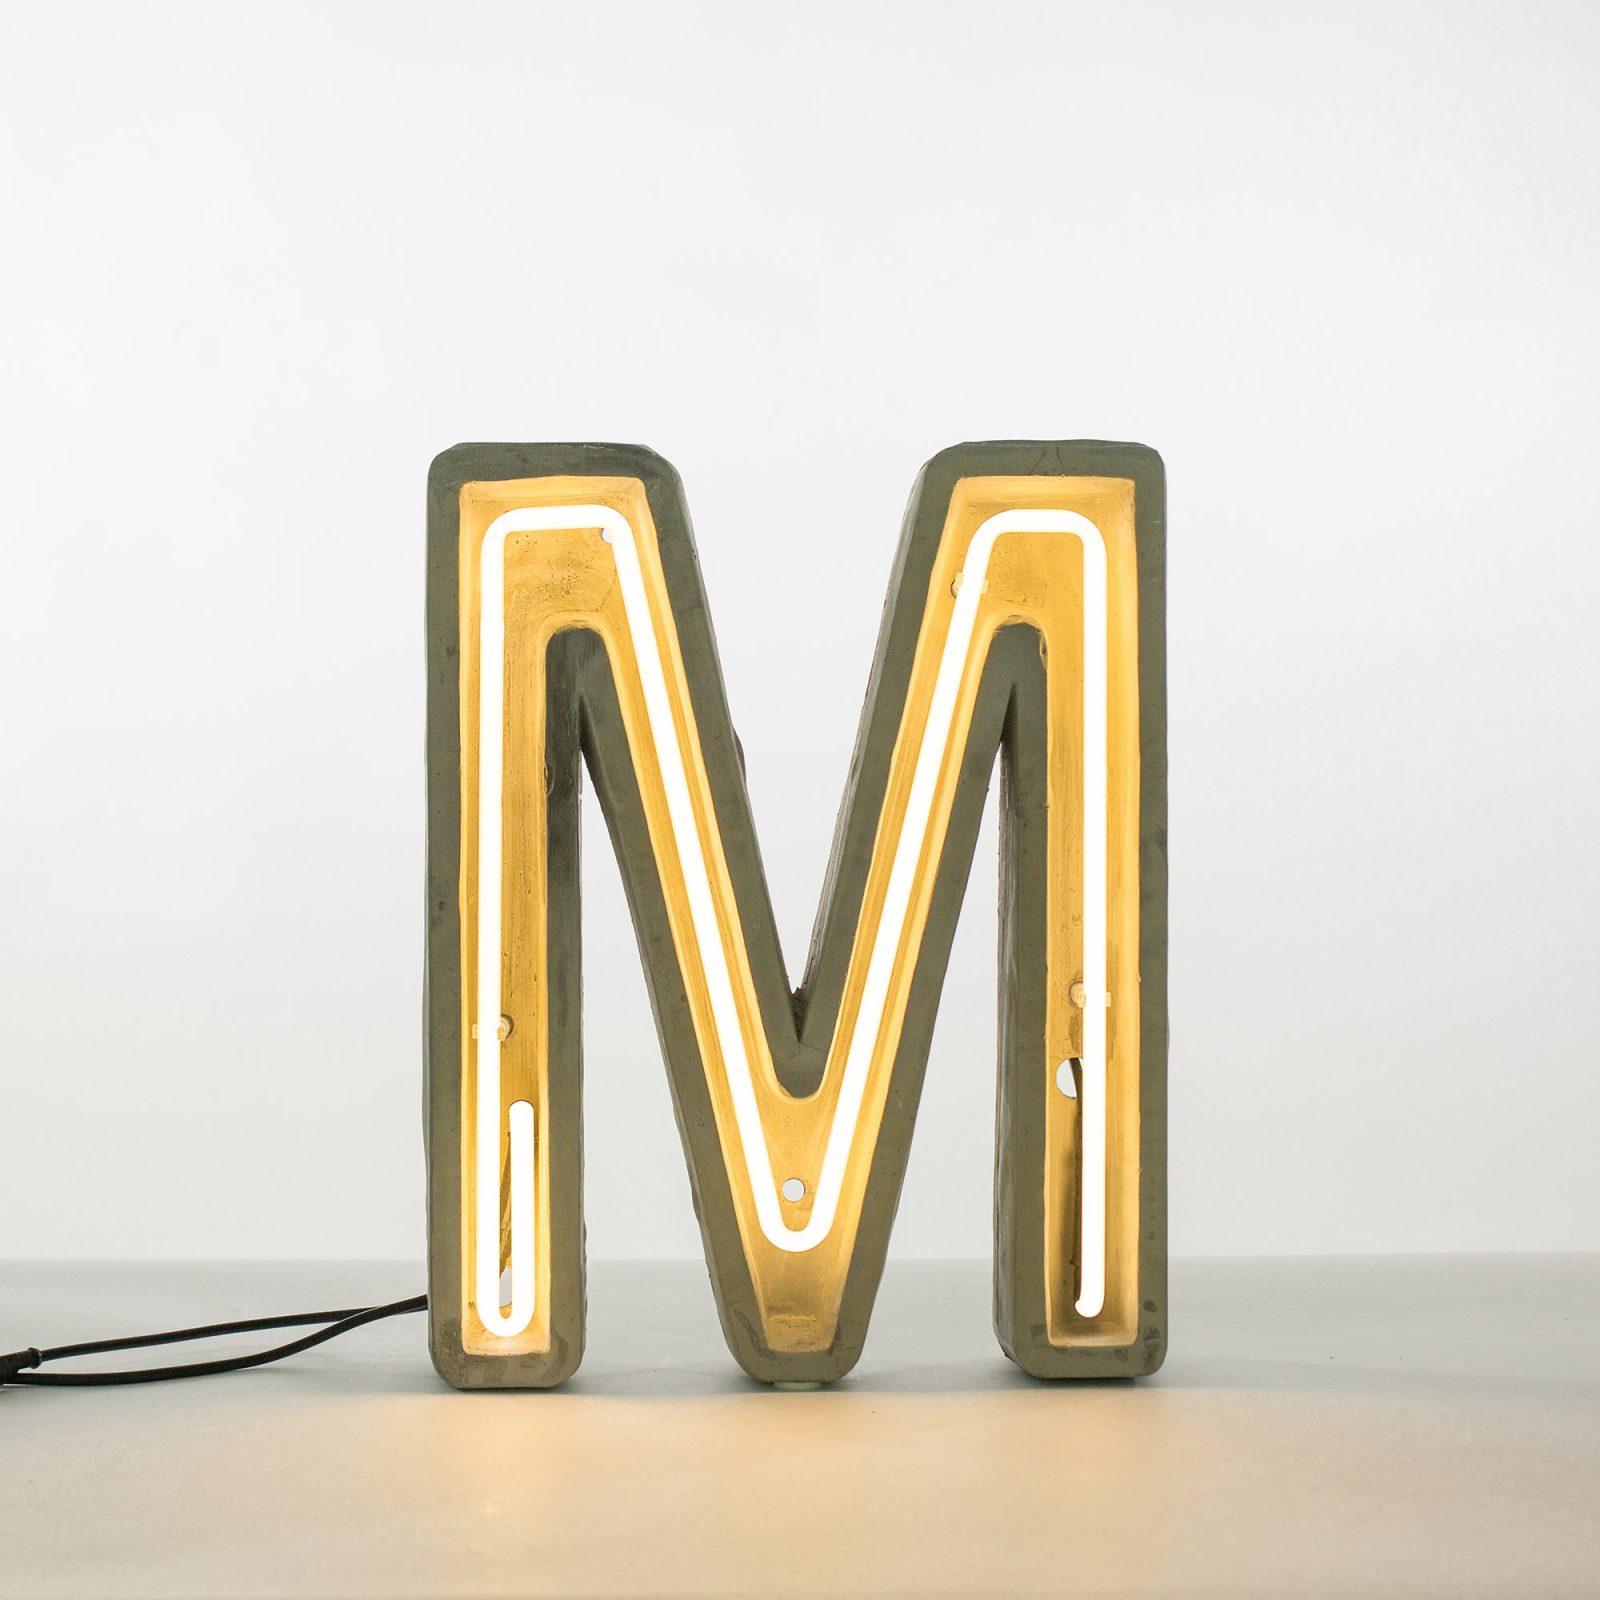 Alphacrete, Concrete Neon Light – M-32211